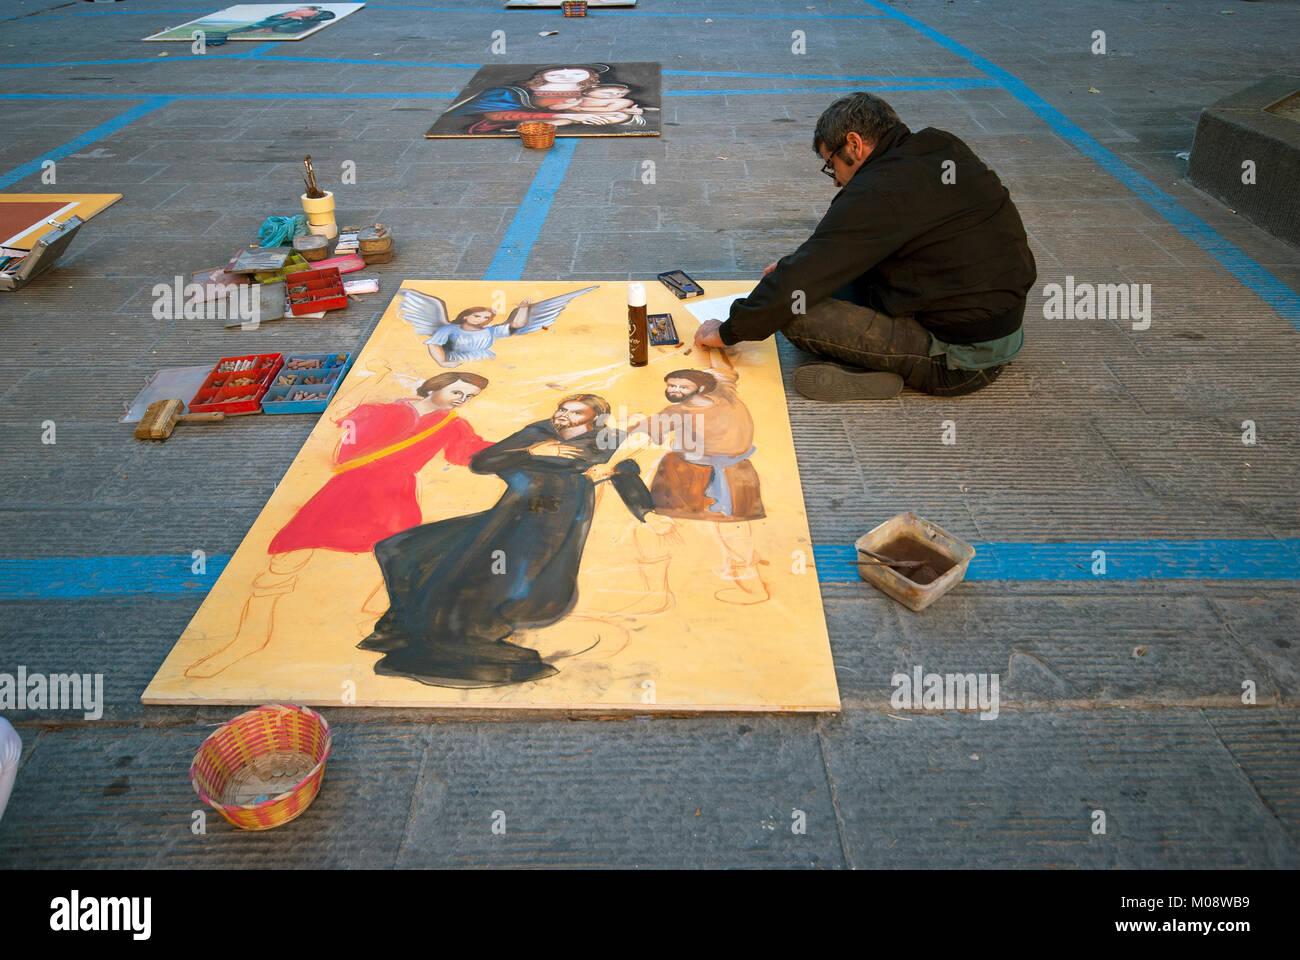 Street painter at work, Città della Pieve, Umbria, Italy - Stock Image